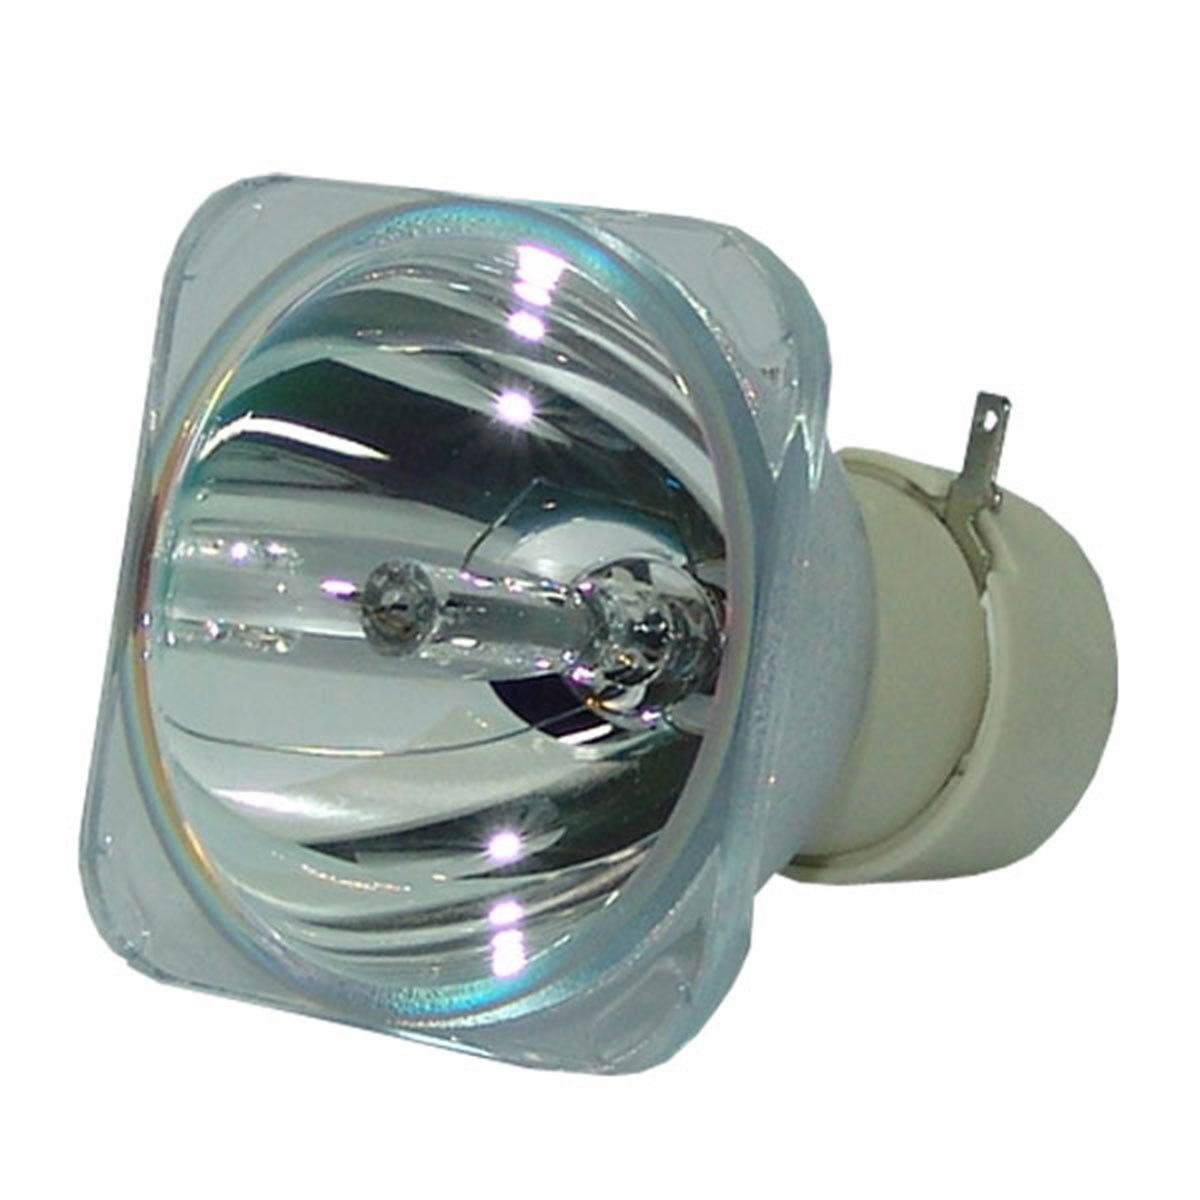 BenQ MP612 Multimedia Video Projector Brand New Original Projector Bulb by BenQ